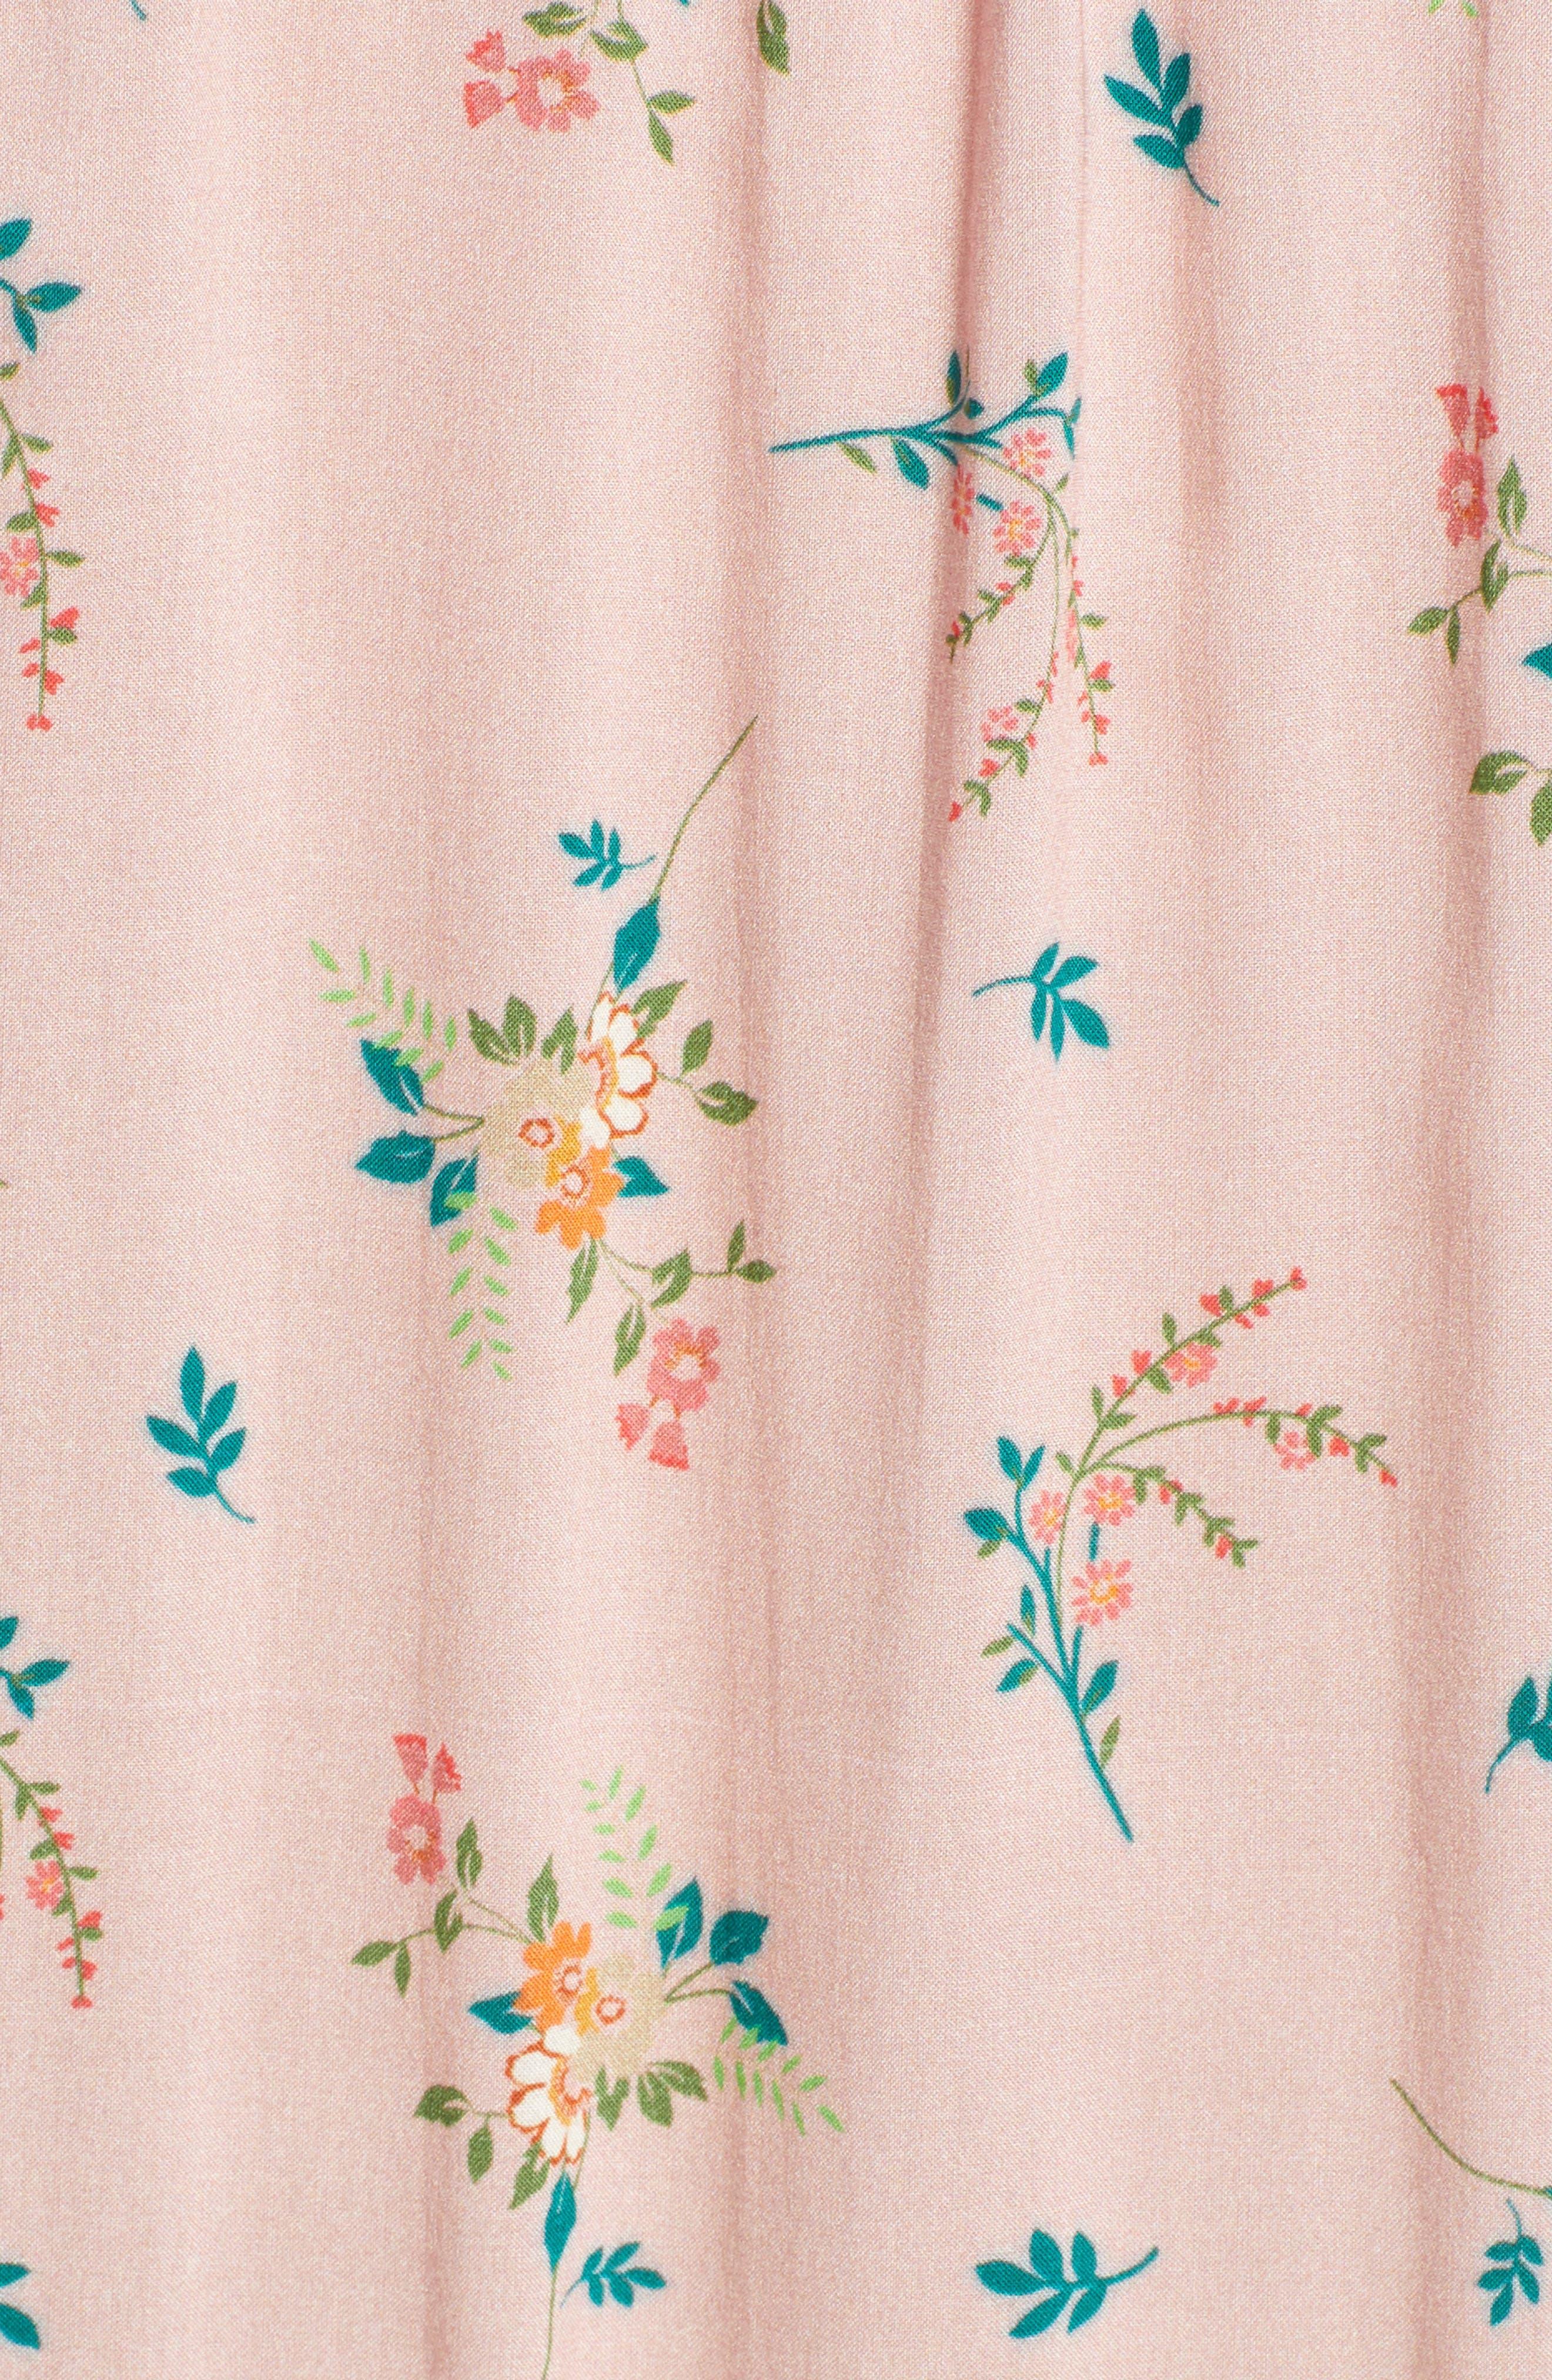 Floral Print Ruffle Minidress,                             Alternate thumbnail 6, color,